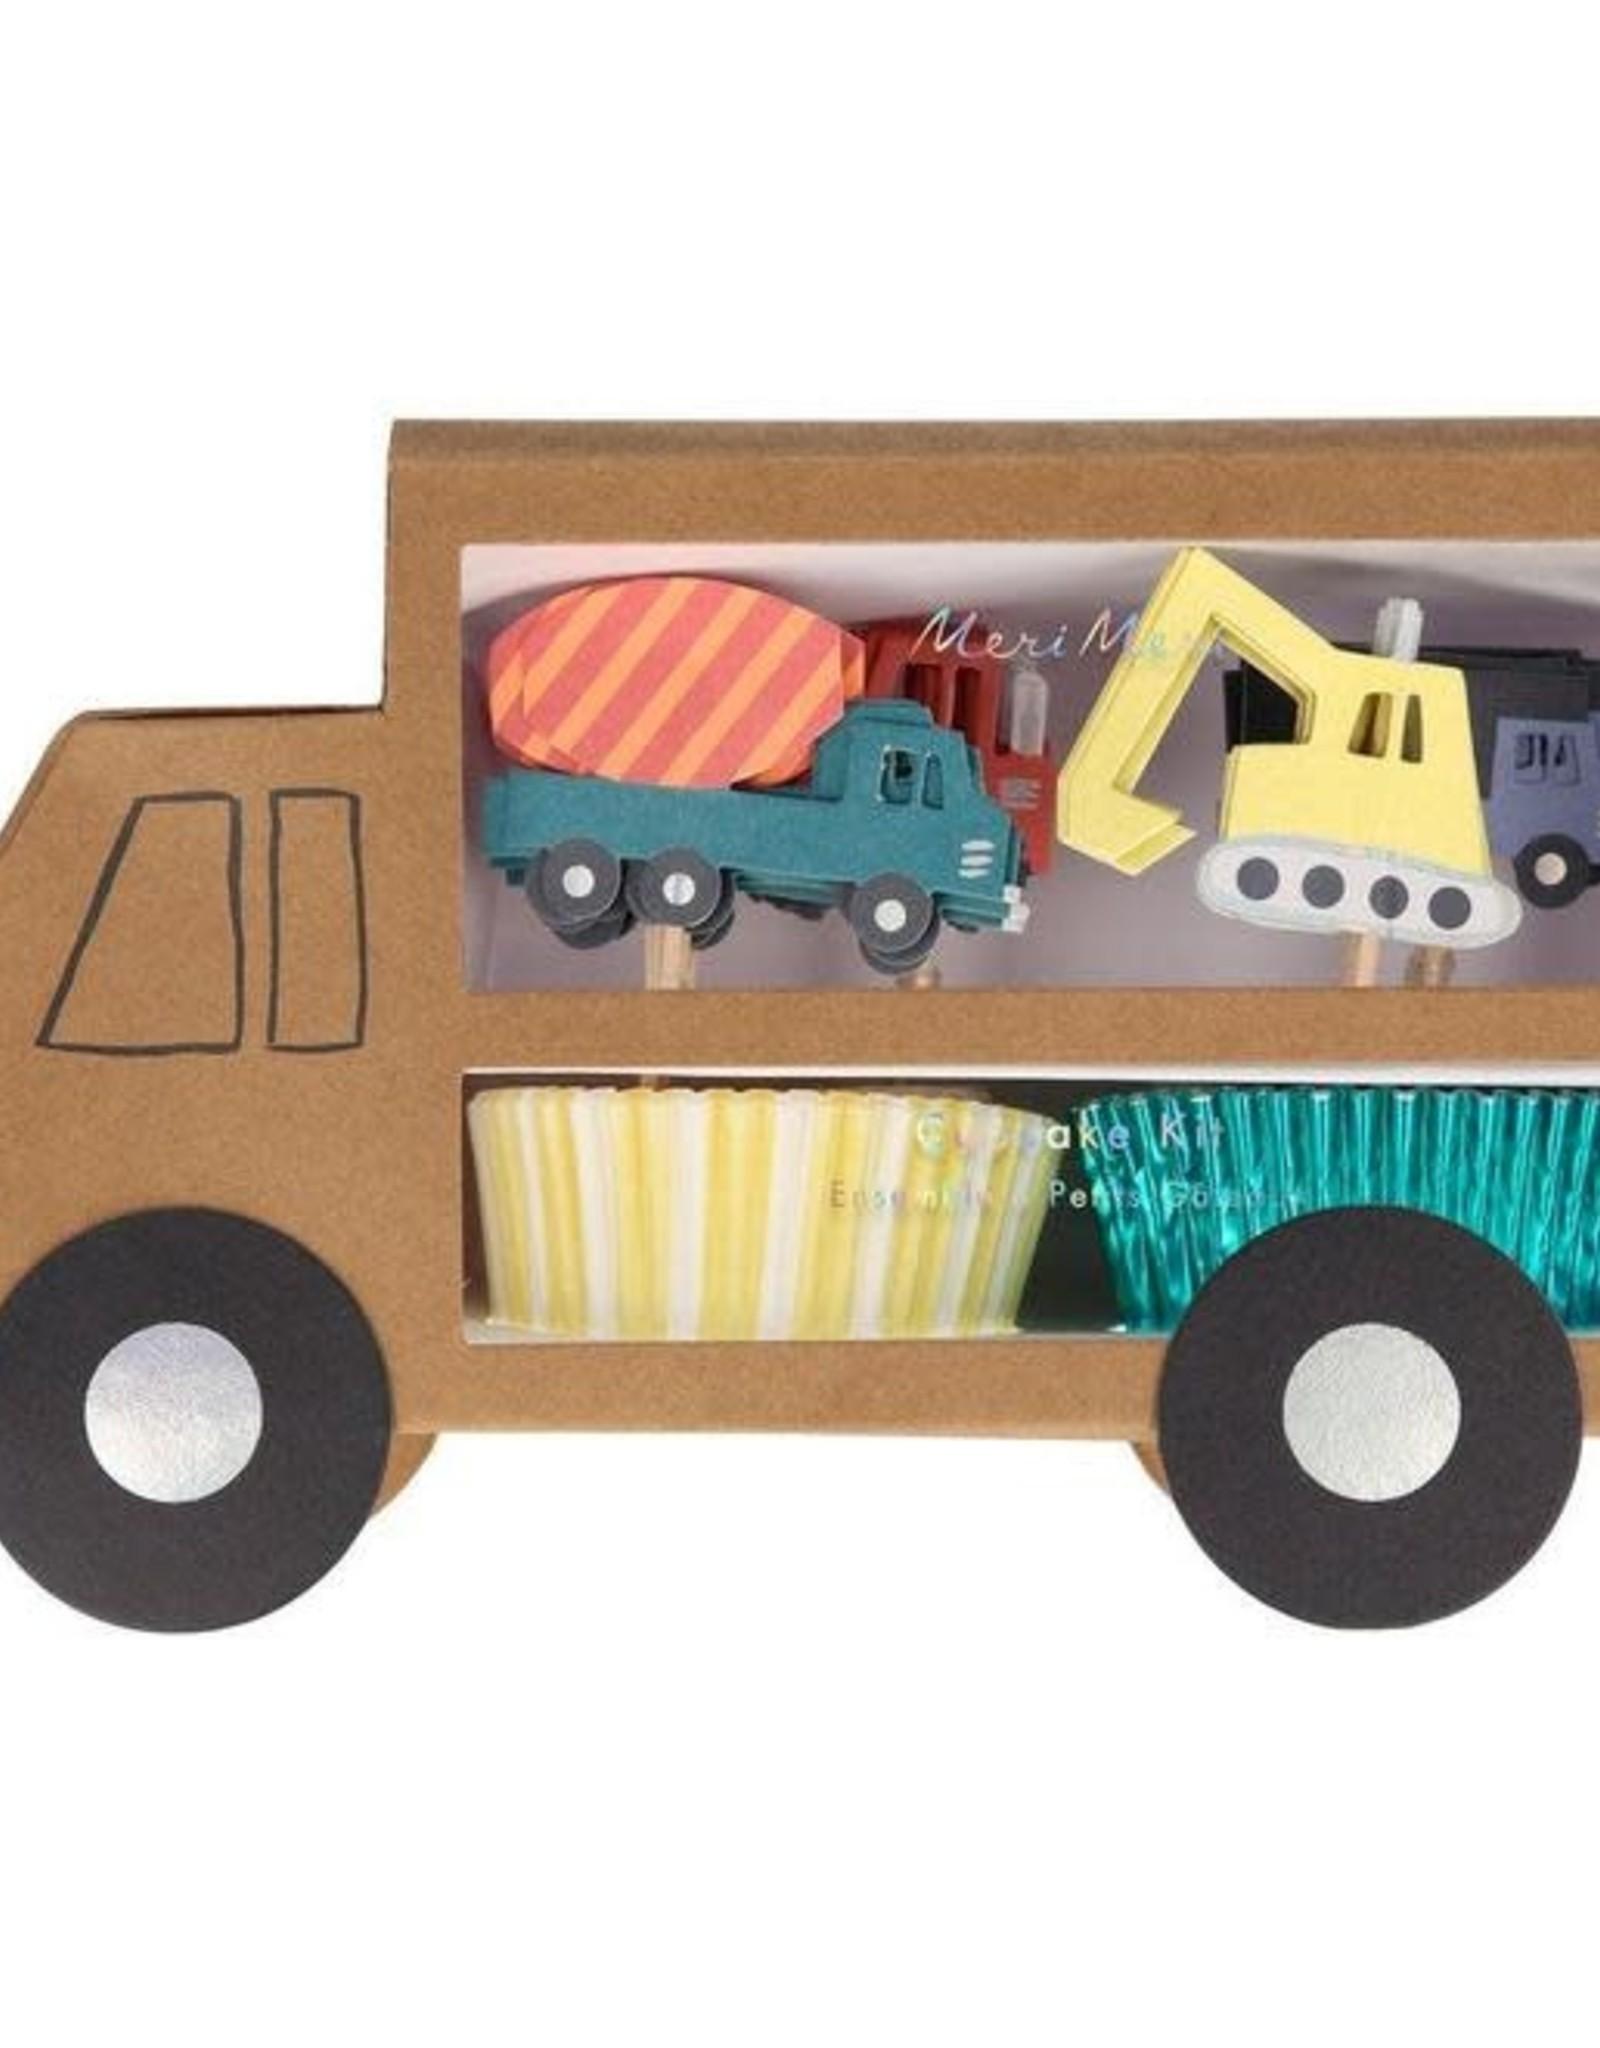 Meri Meri Meri Meri | Construction Cupcake Kit (set of 24 toppers)